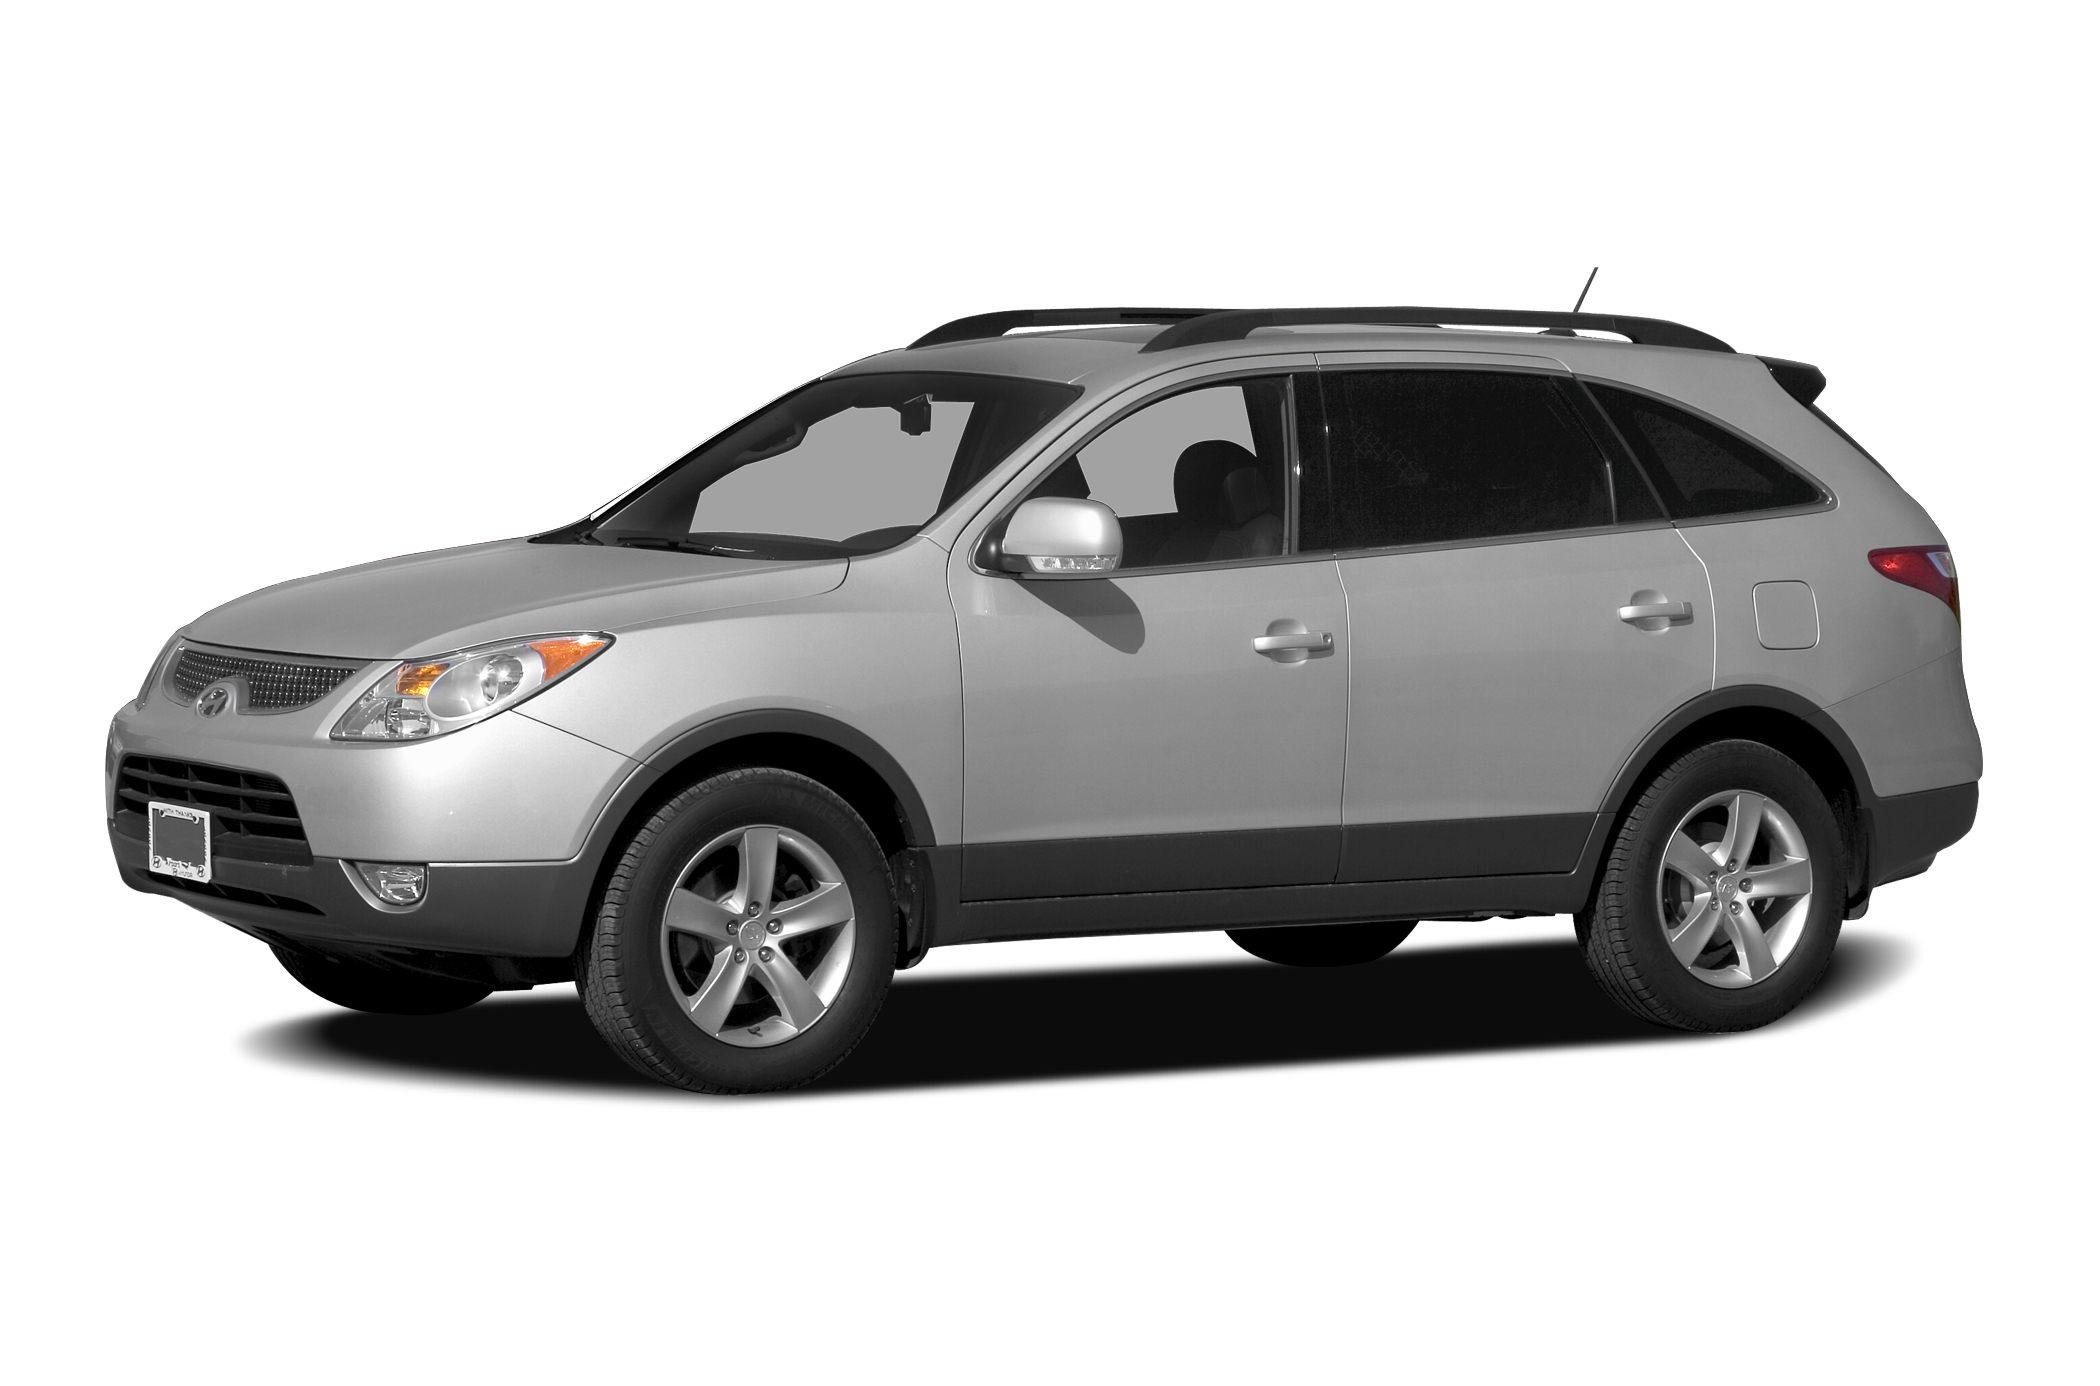 2007 Hyundai Veracruz Limited SUV for sale in Marietta for $14,997 with 106,175 miles